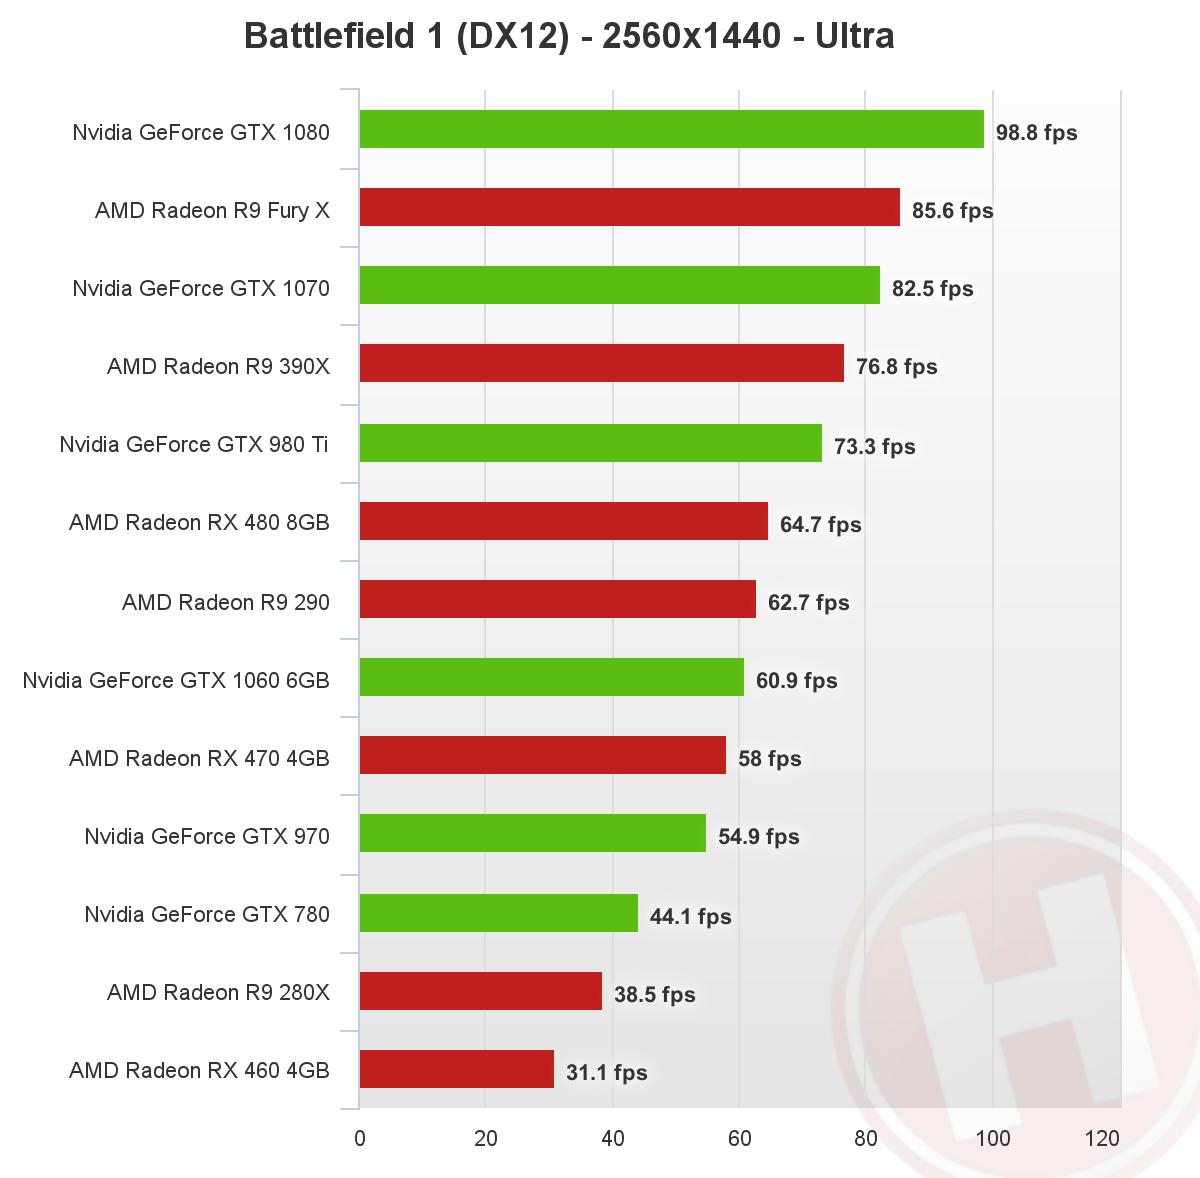 Battlefield 1 DirectX 12 - 1440p - Nvidia, AMD